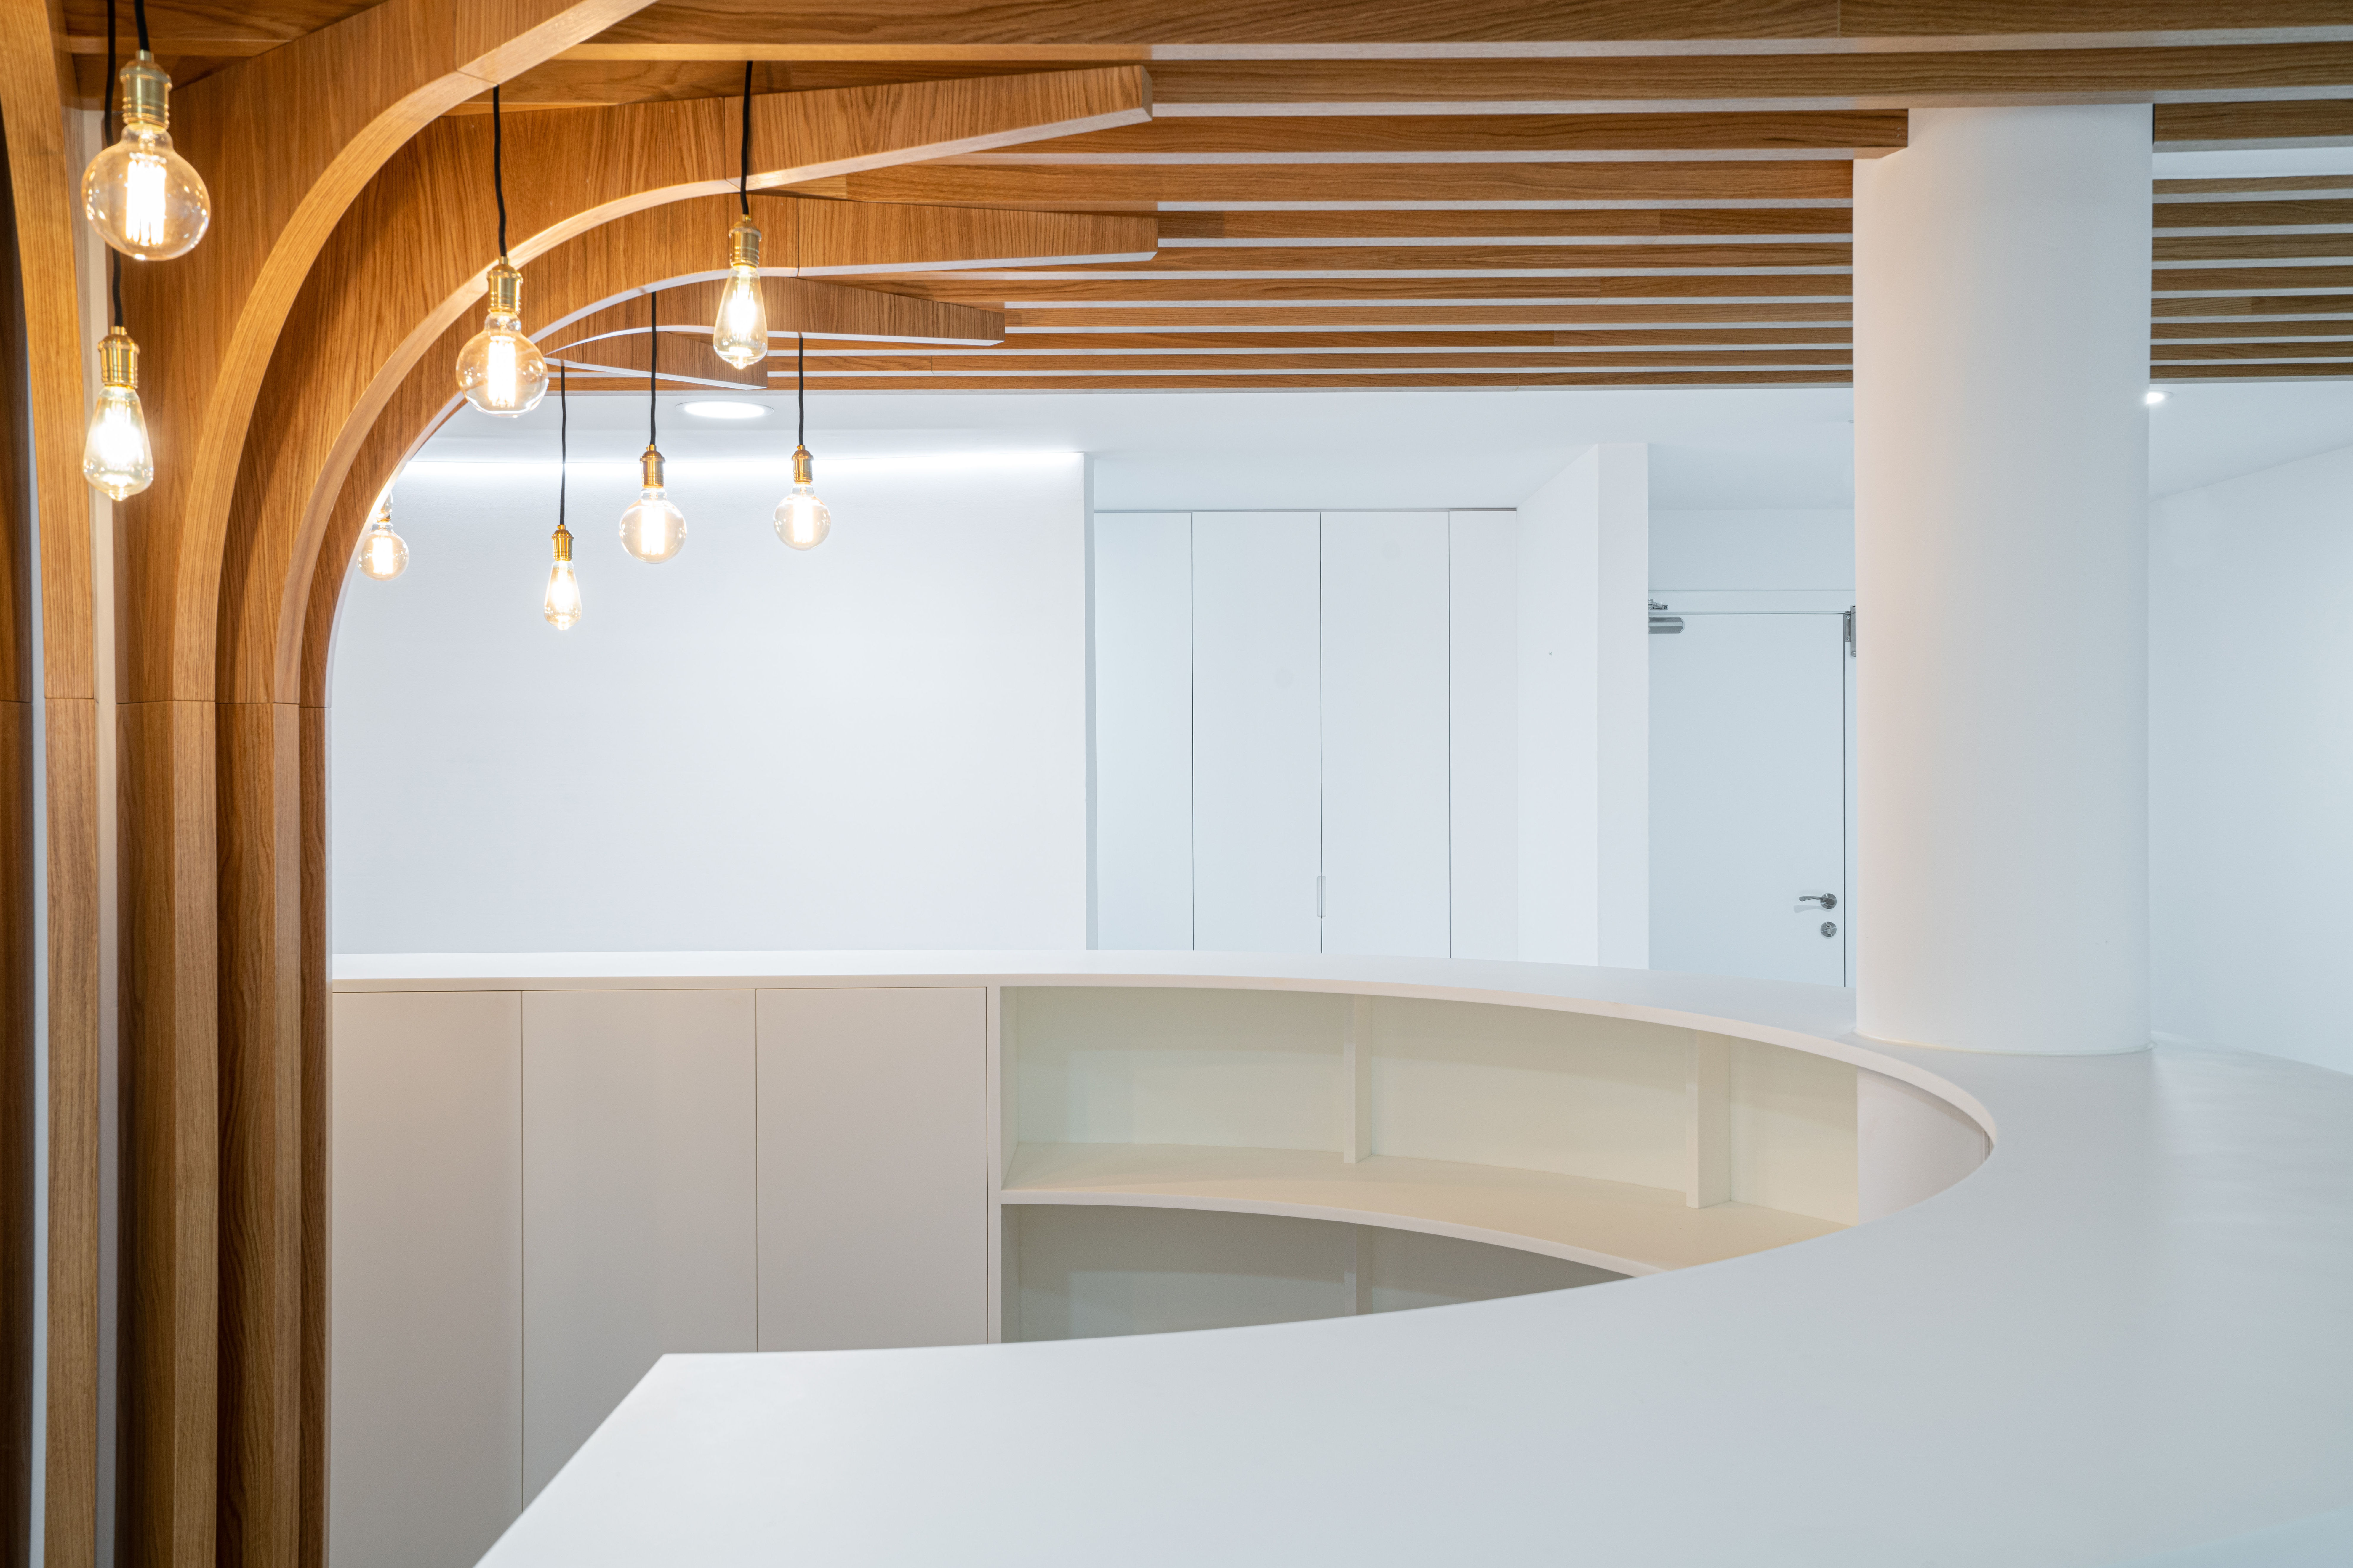 Foto 5 de Fabricantes de Krion en Zamora | Werke Design